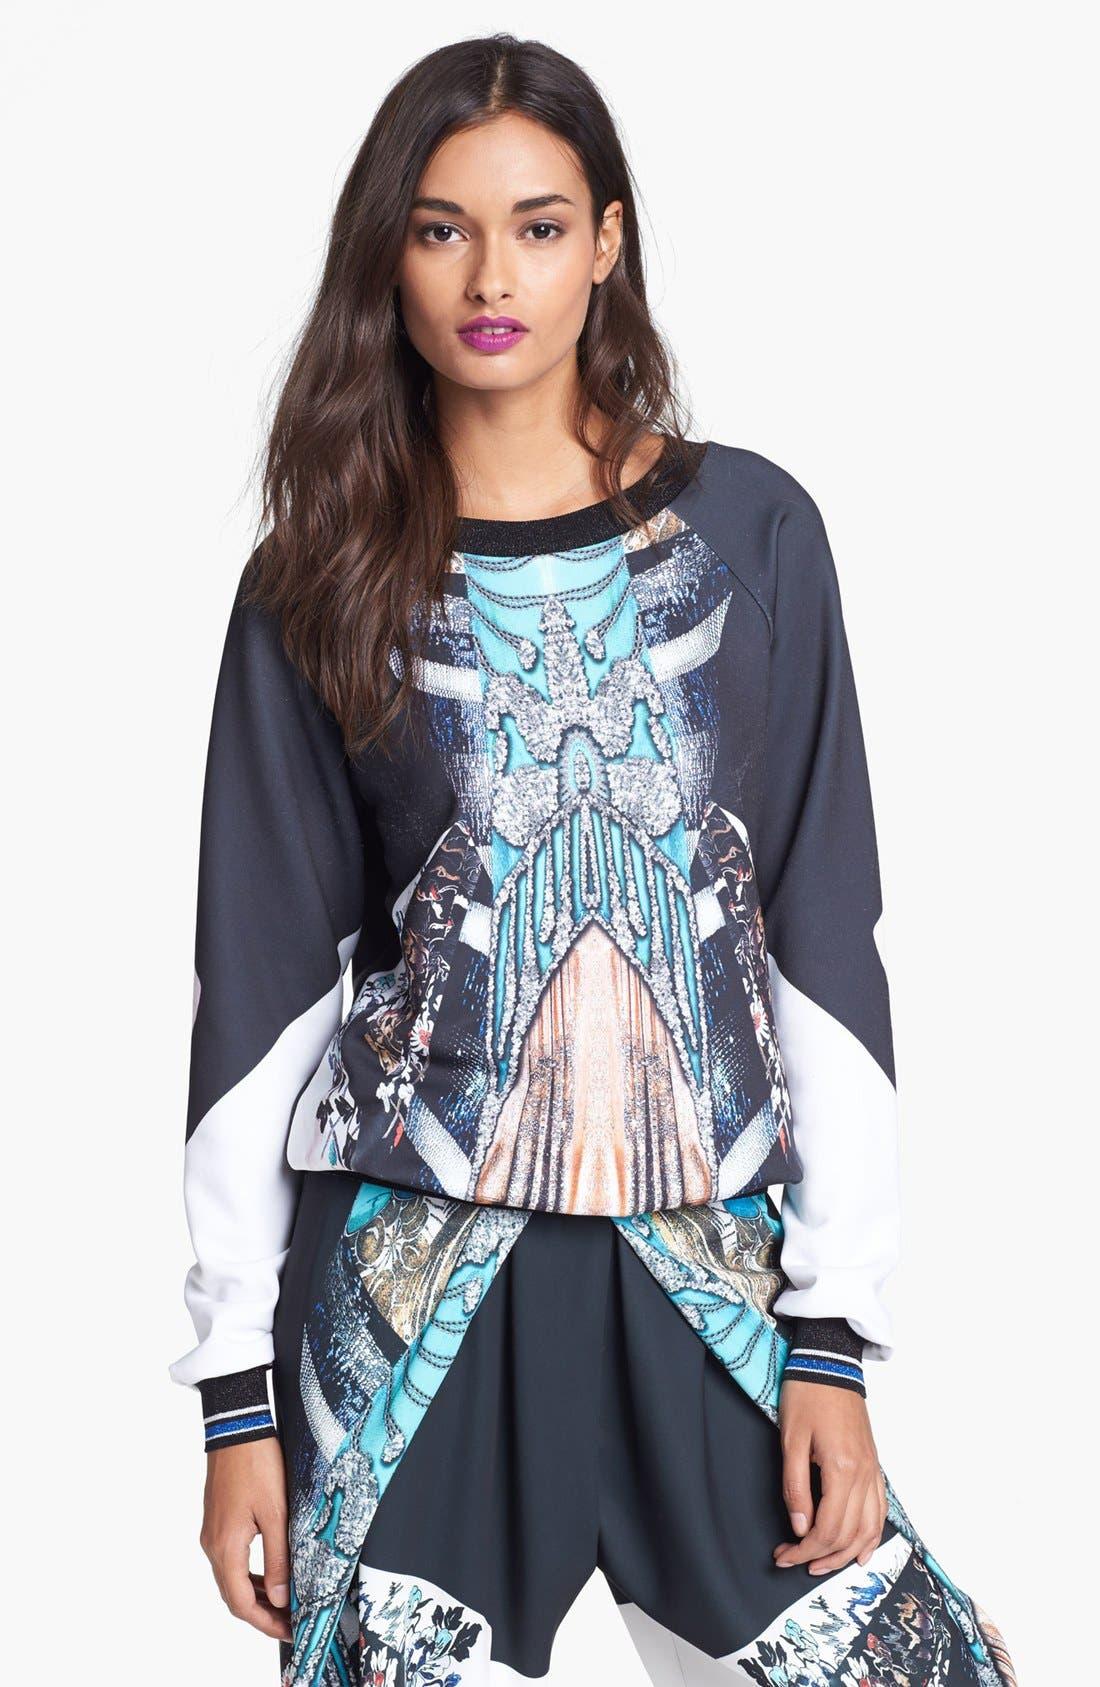 Main Image - Clover Canyon 'All That Jazz' Print Sweatshirt